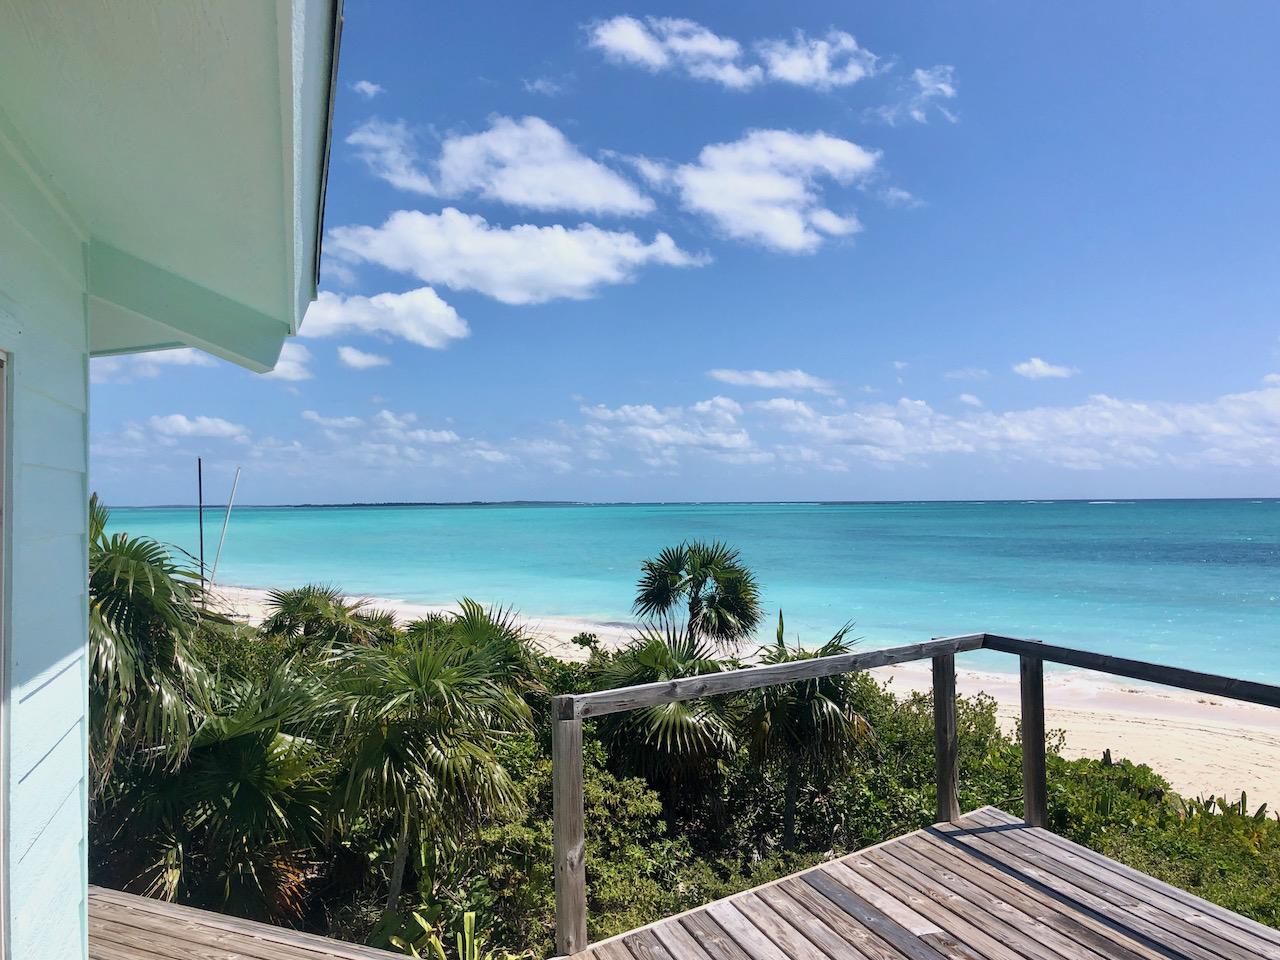 bahama-palm-shores-beachfront-home-for-sale-2